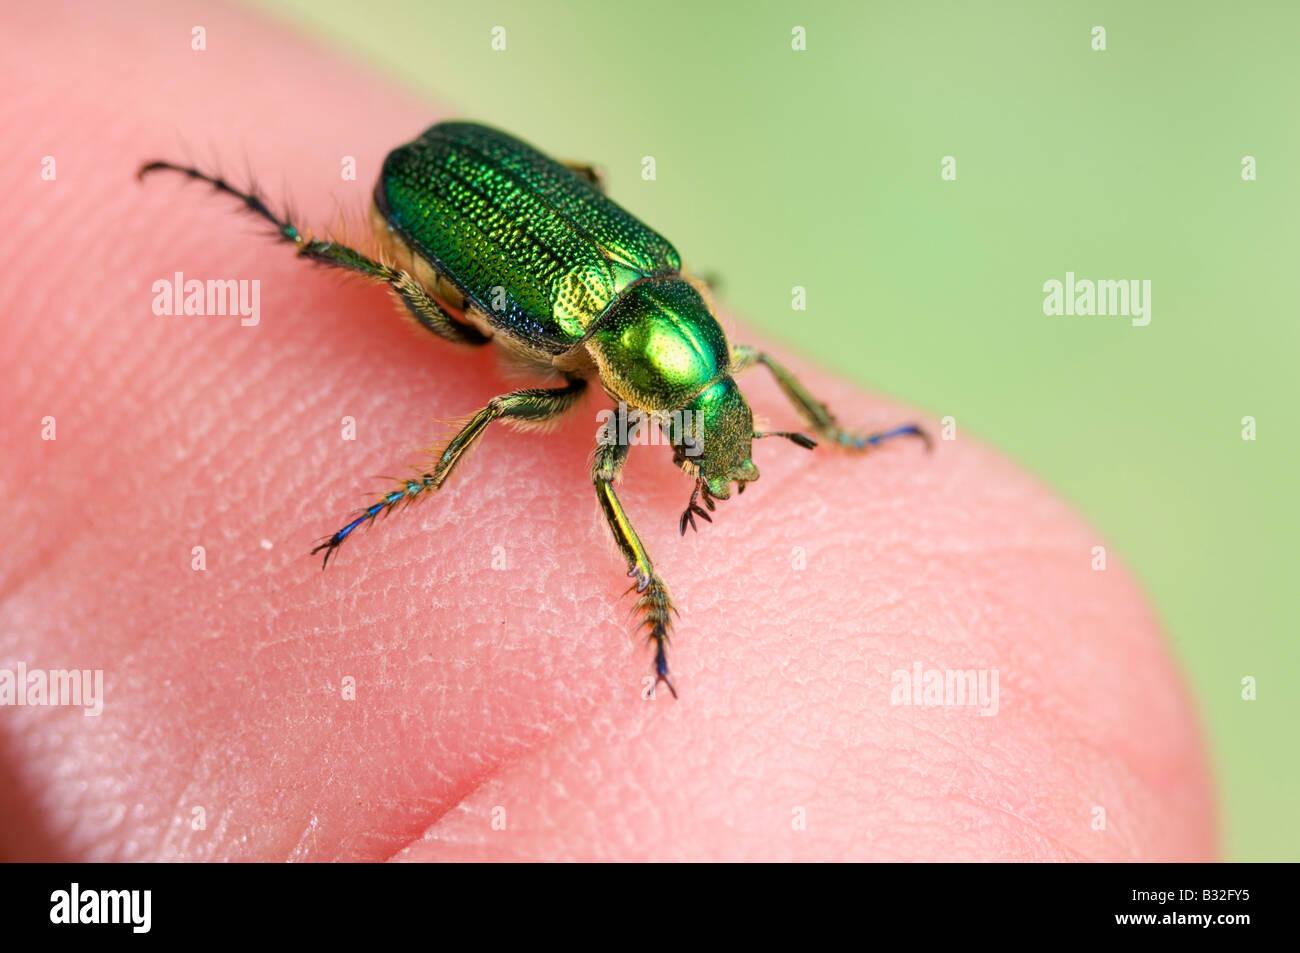 Australian verde scarabeo scarabeo sul dito umano Foto Stock